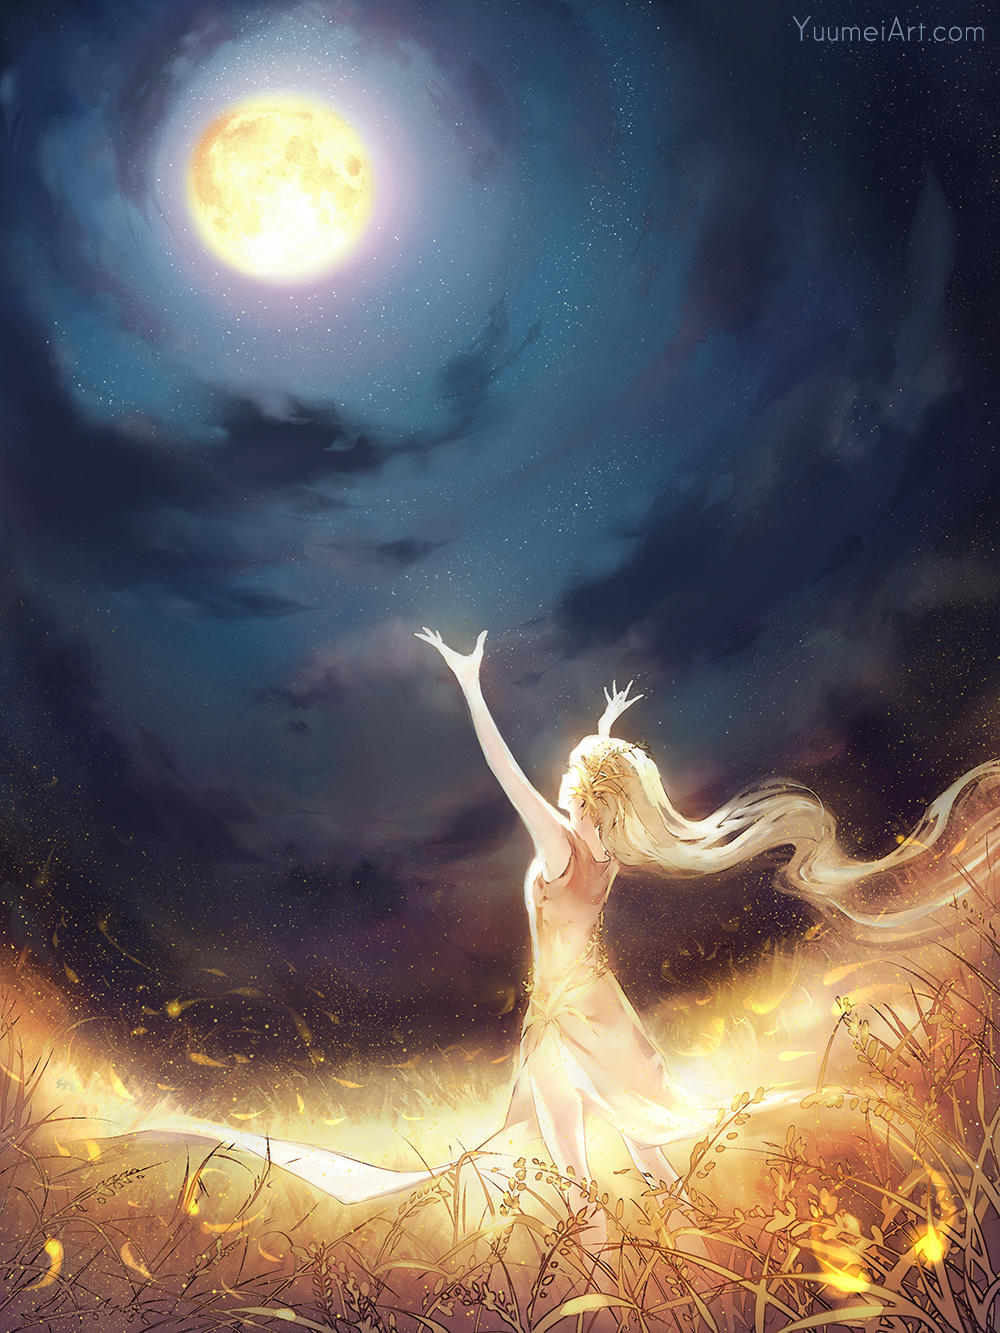 Moon Catcher by yuumei